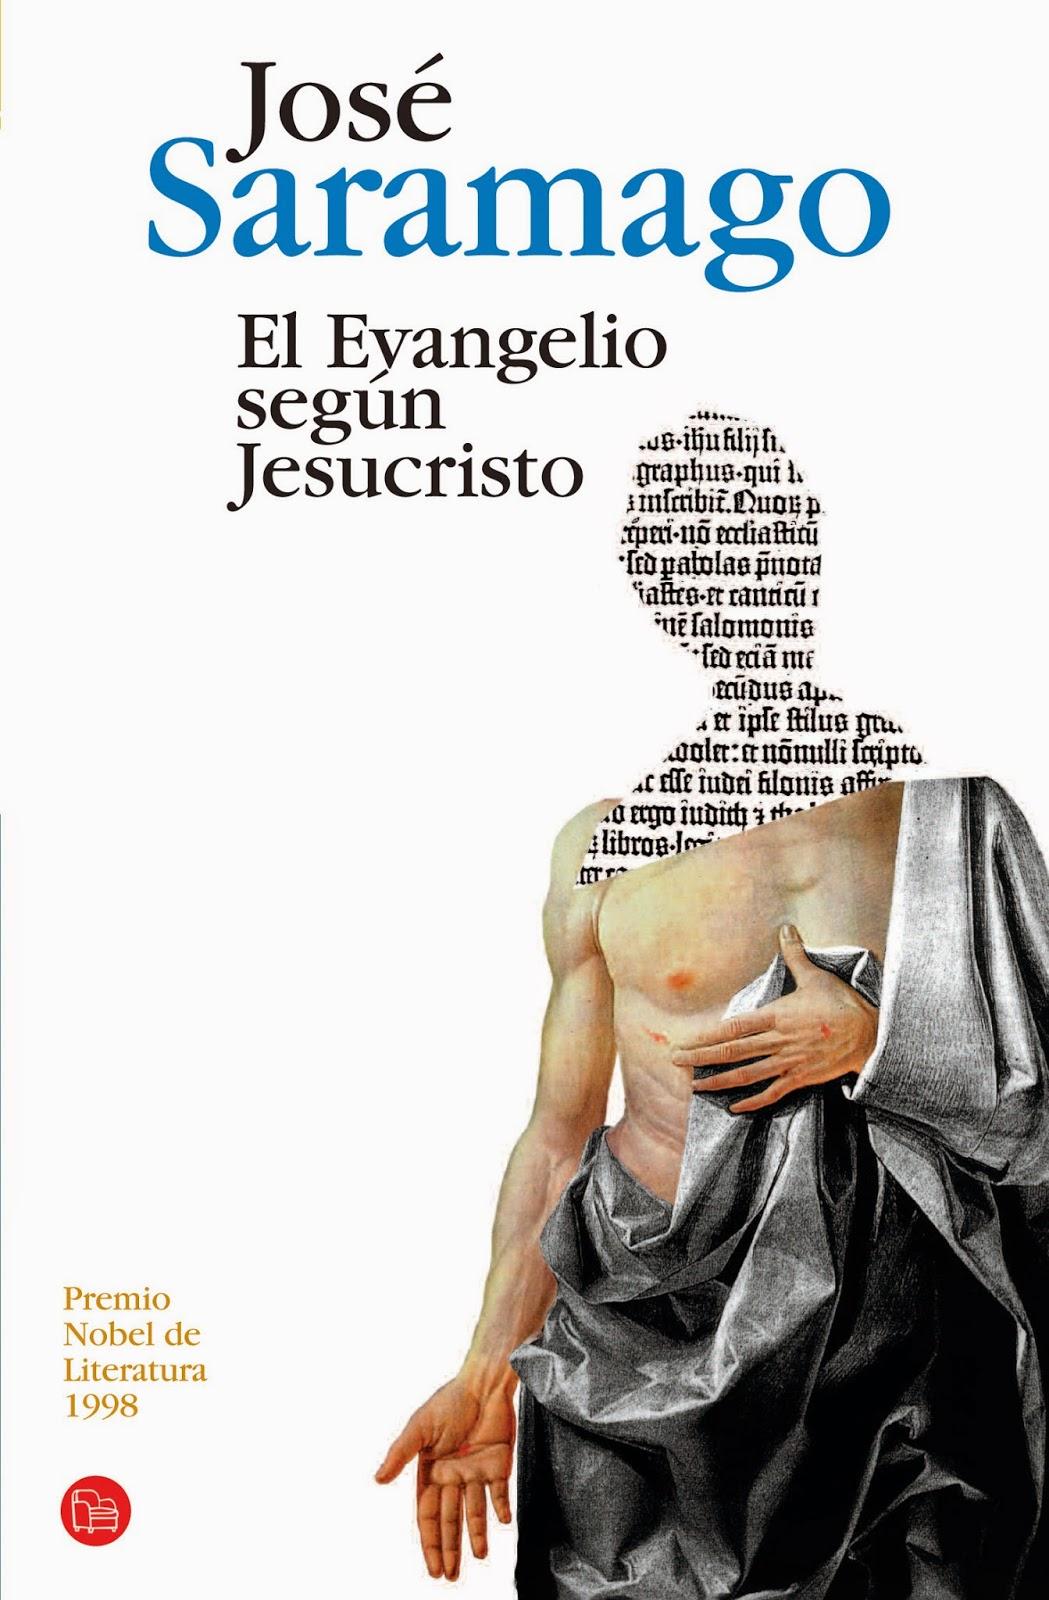 Portada de la novela El evangelio según Jesucristo